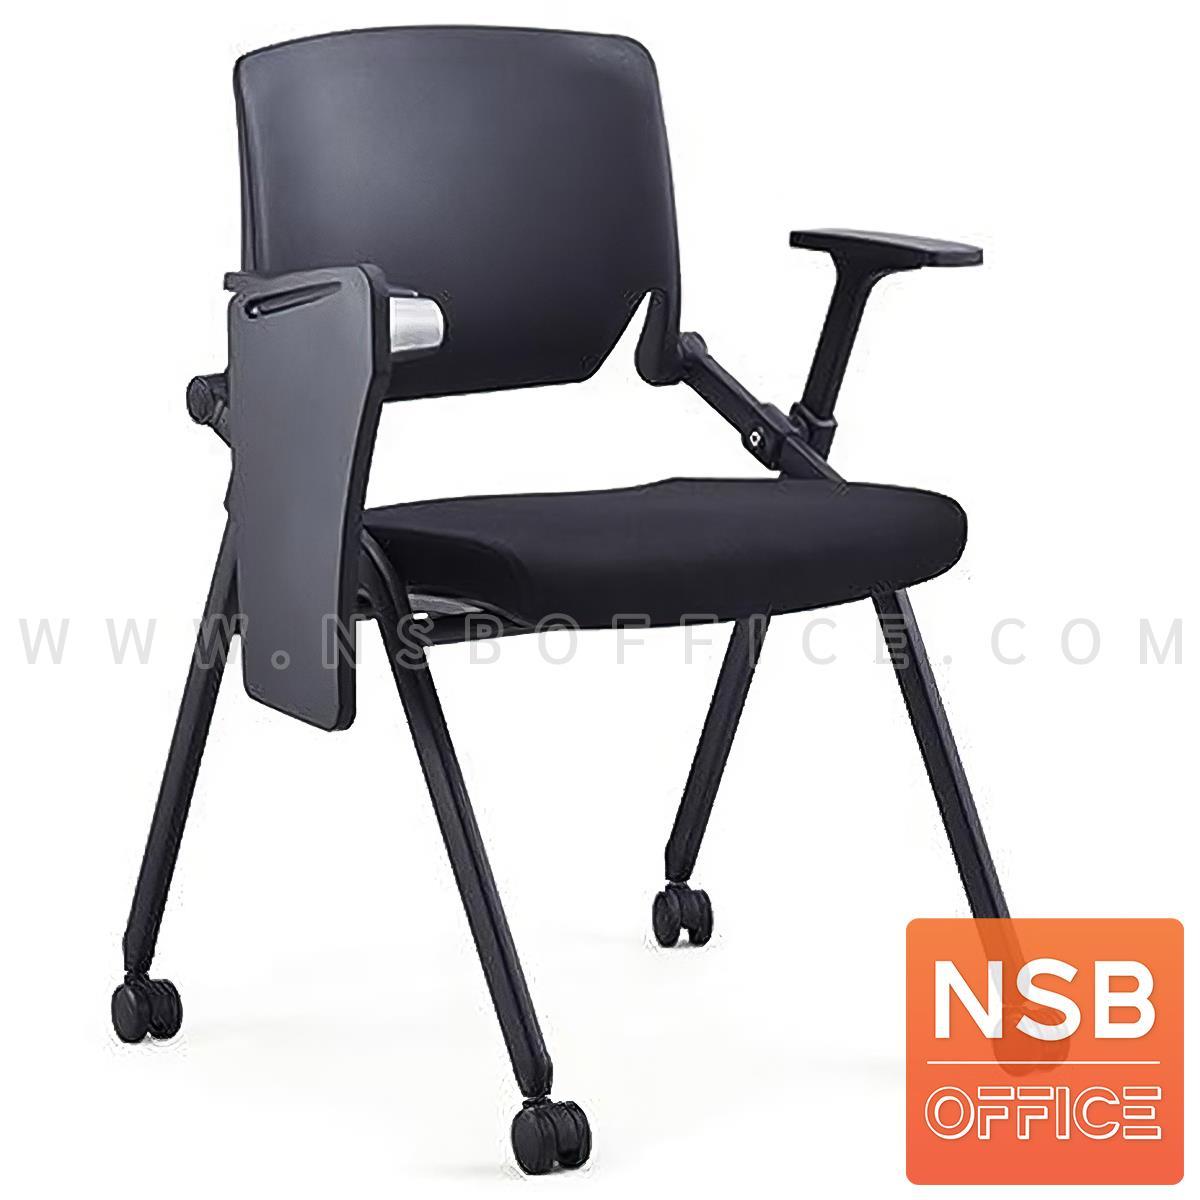 B07A100:เก้าอี้เลคเชอร์ รุ่น Neo (นีโอ)  ขาเหล็กพ่นดำ